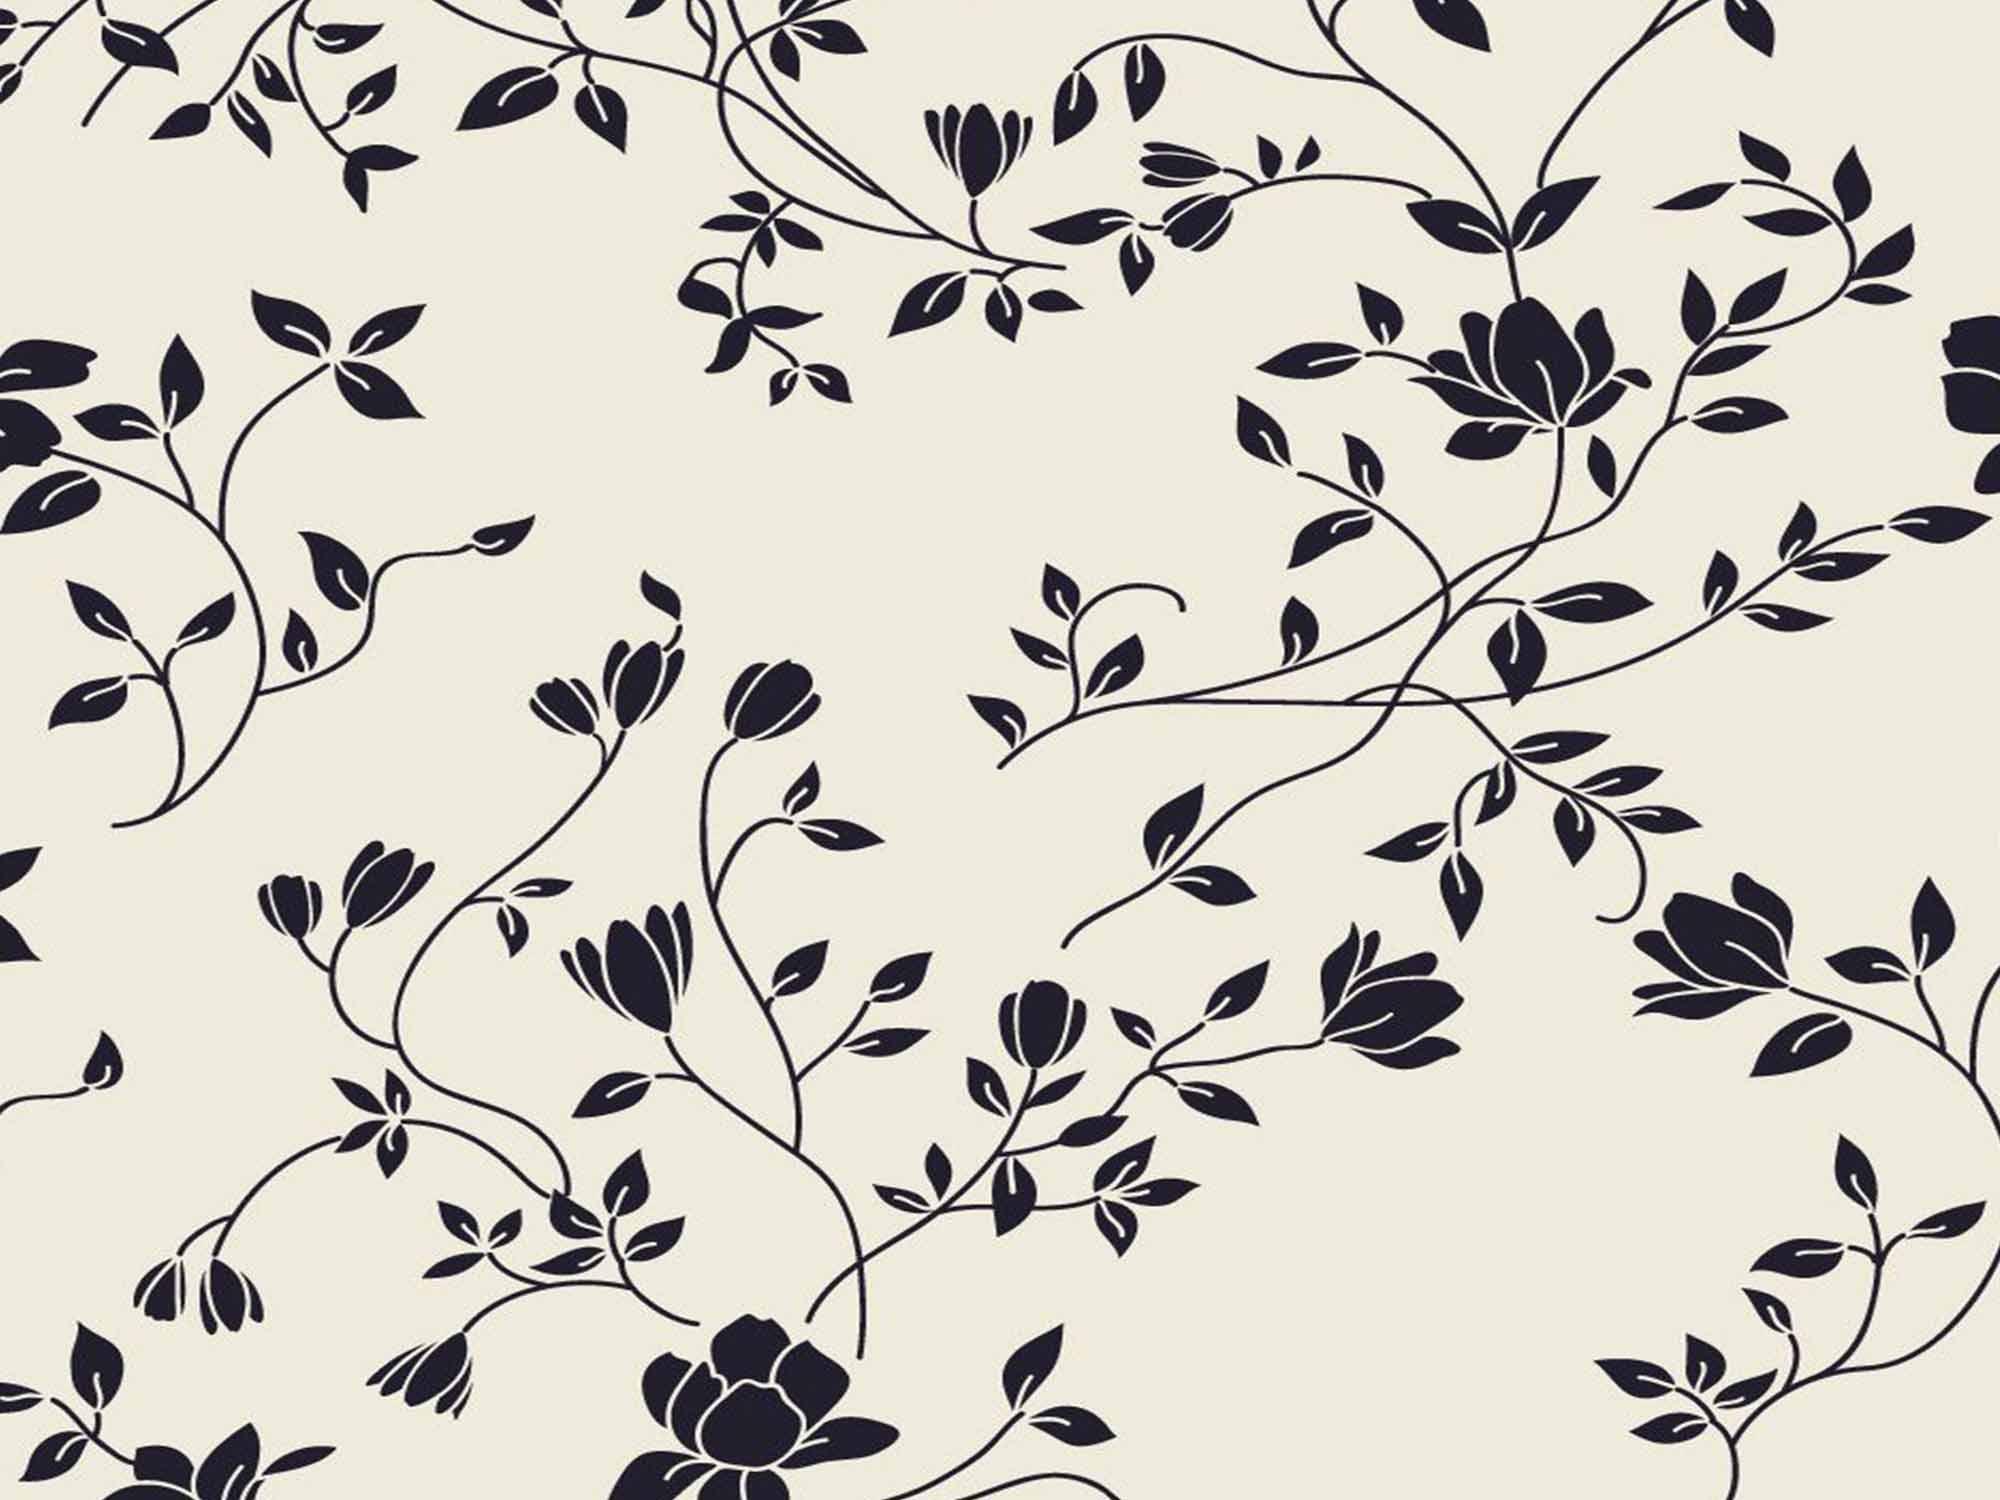 Papel de Parede Floral 0004 - Adesivos de Parede  - Paredes Decoradas